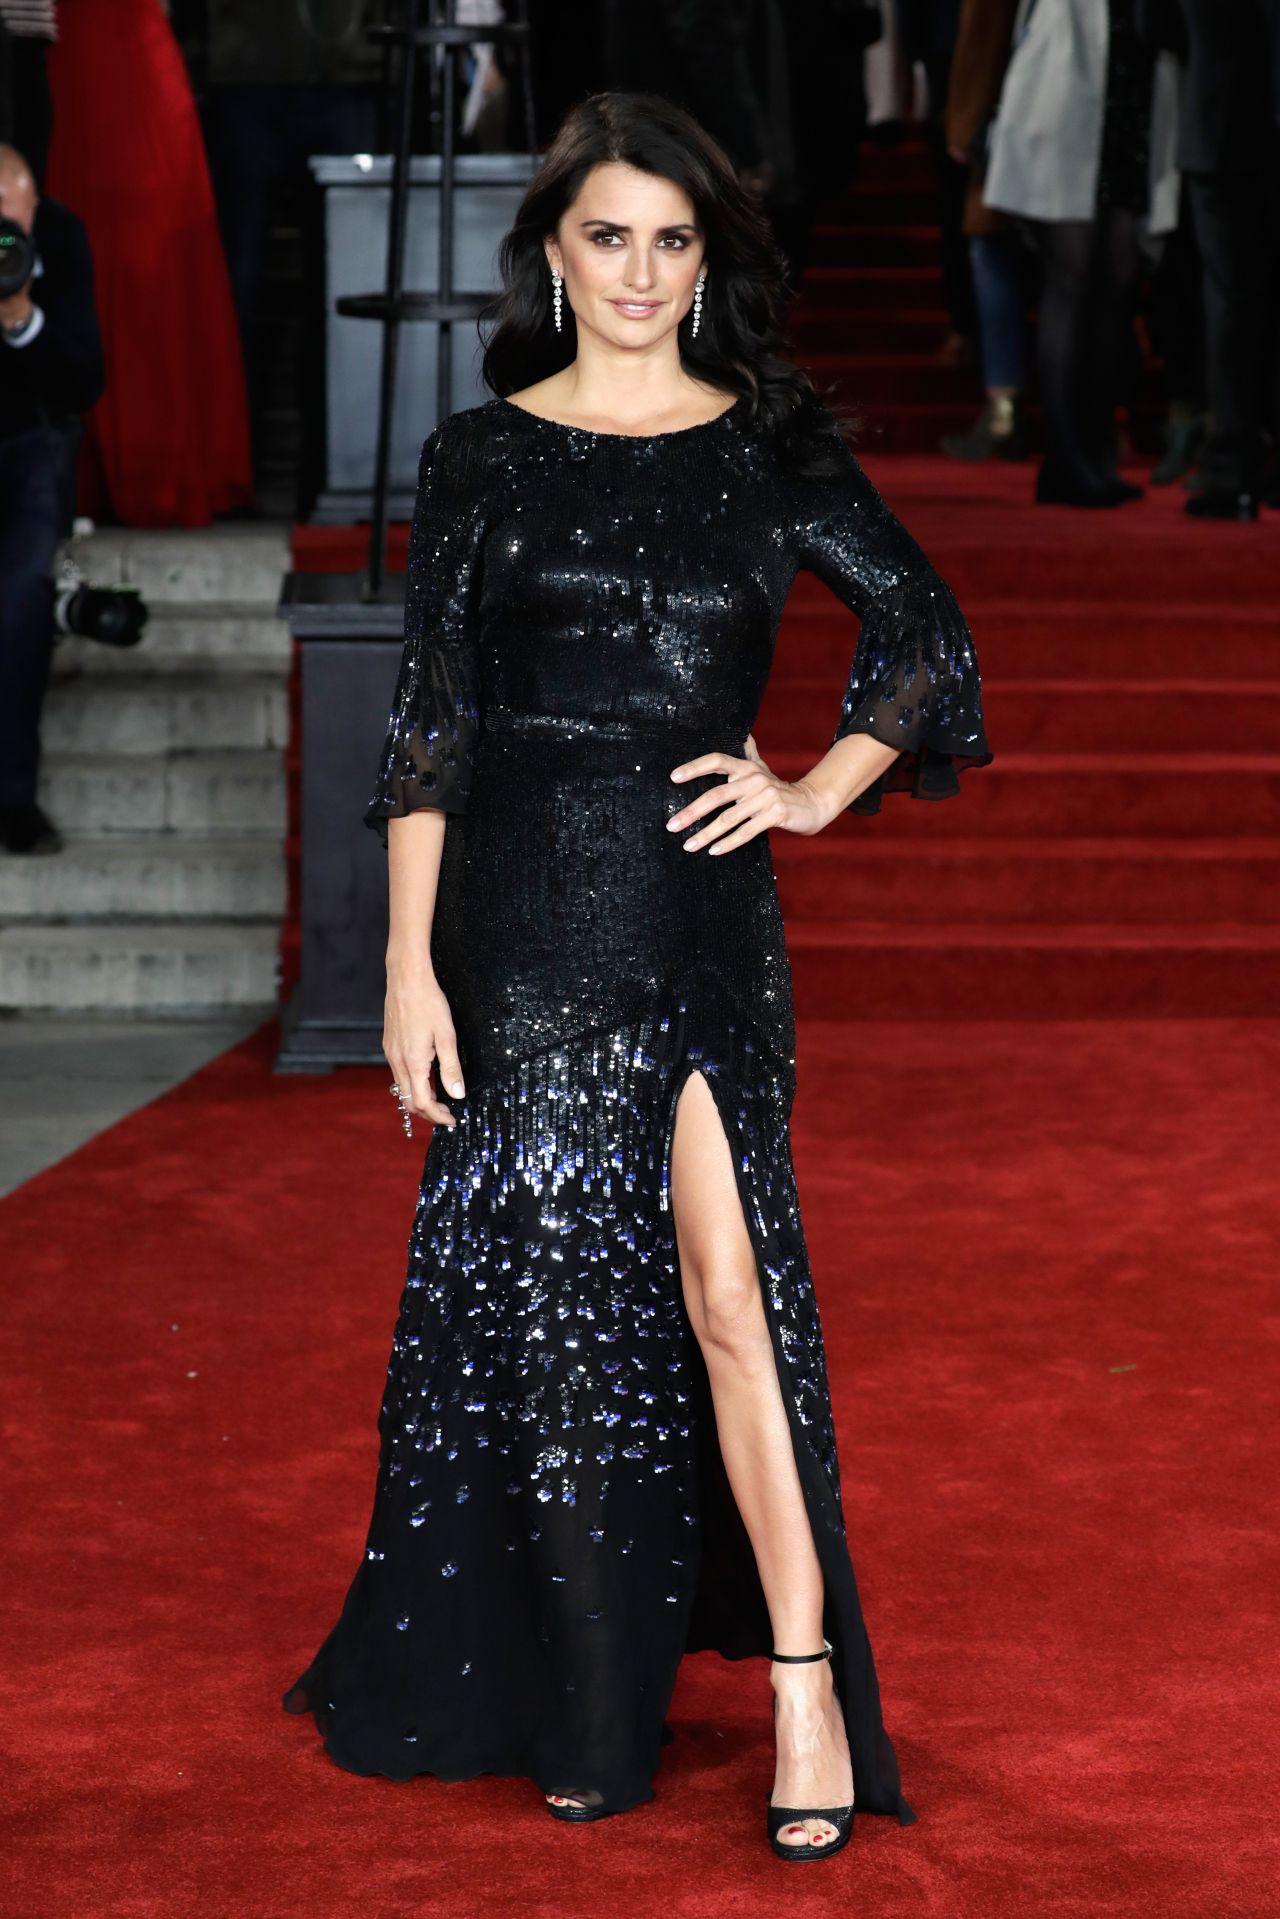 Penelope Cruz Murder On The Orient Express Red Carpet